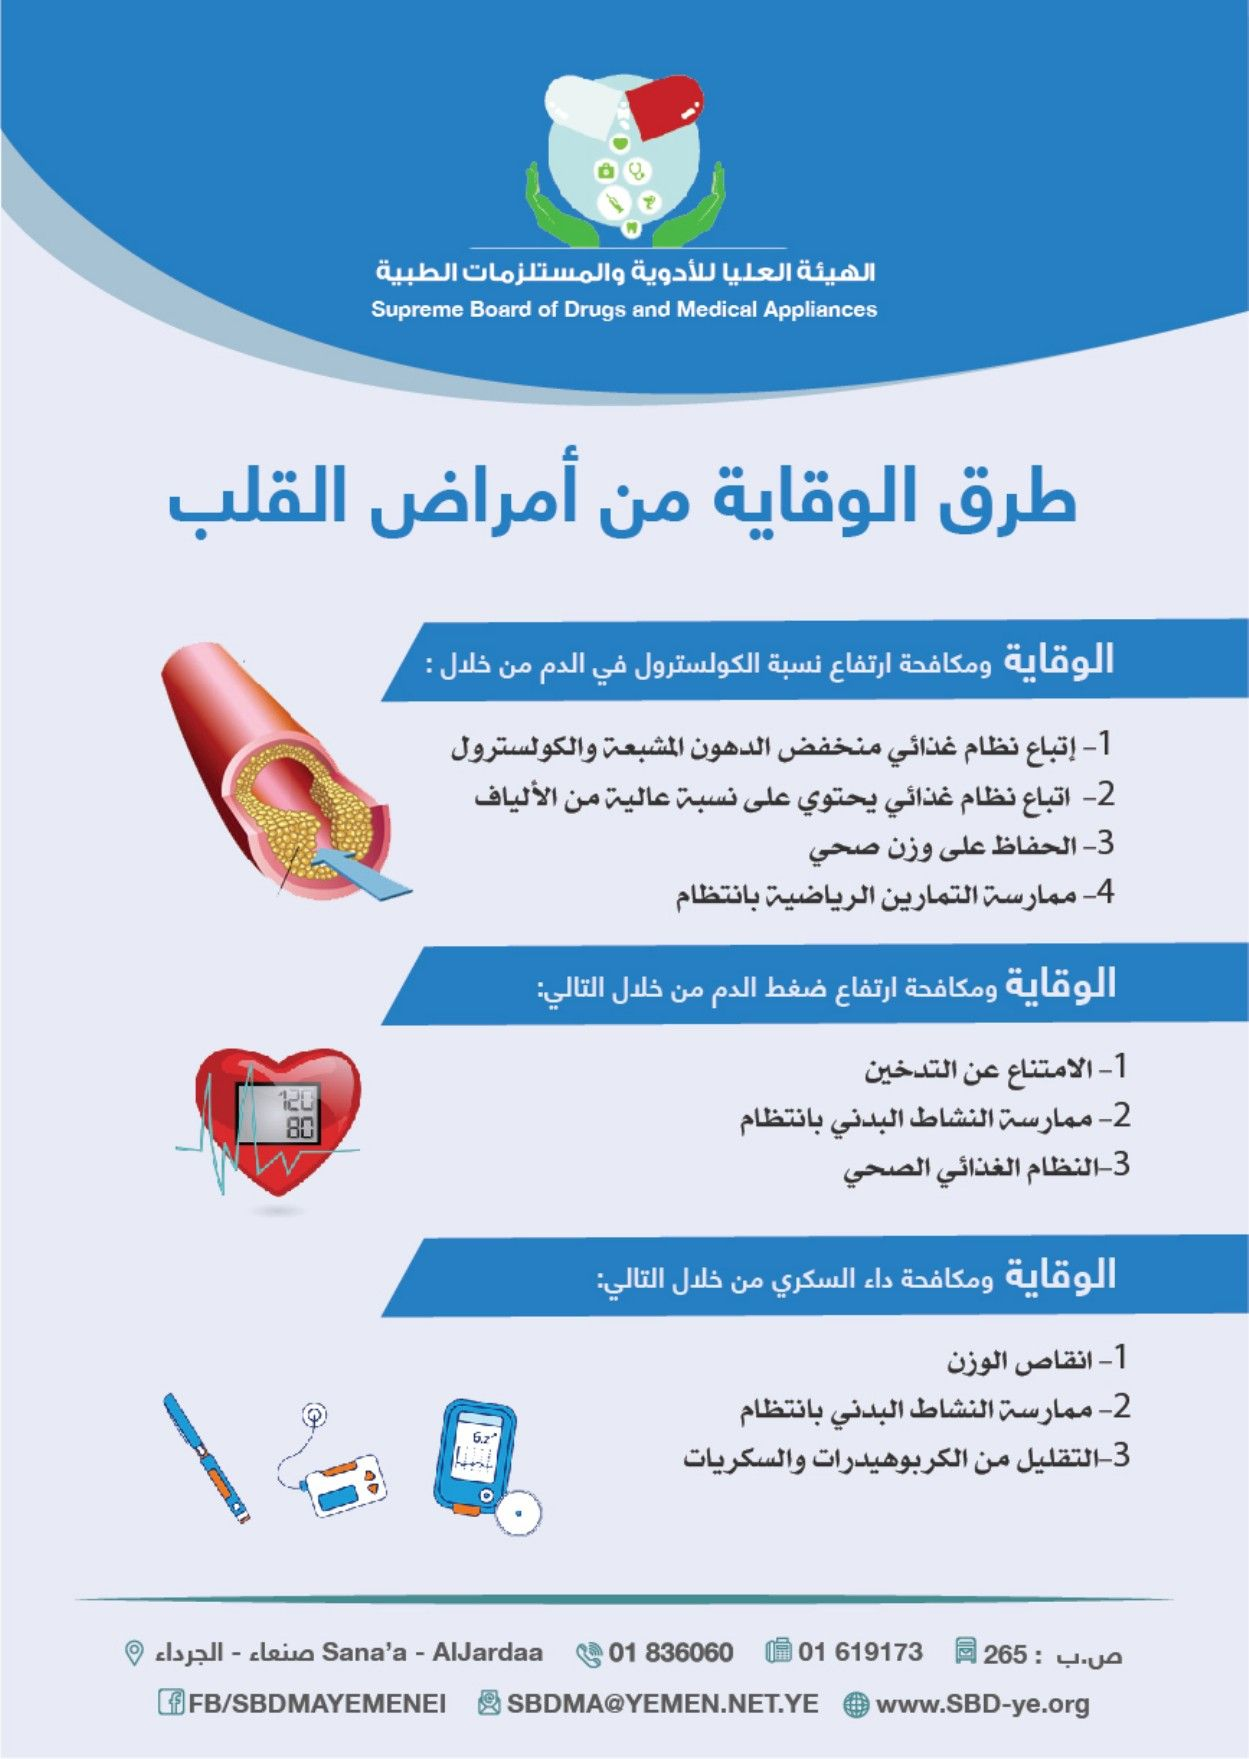 Pin On الهيئة العليا للأدوية والمستلزمات الطبية